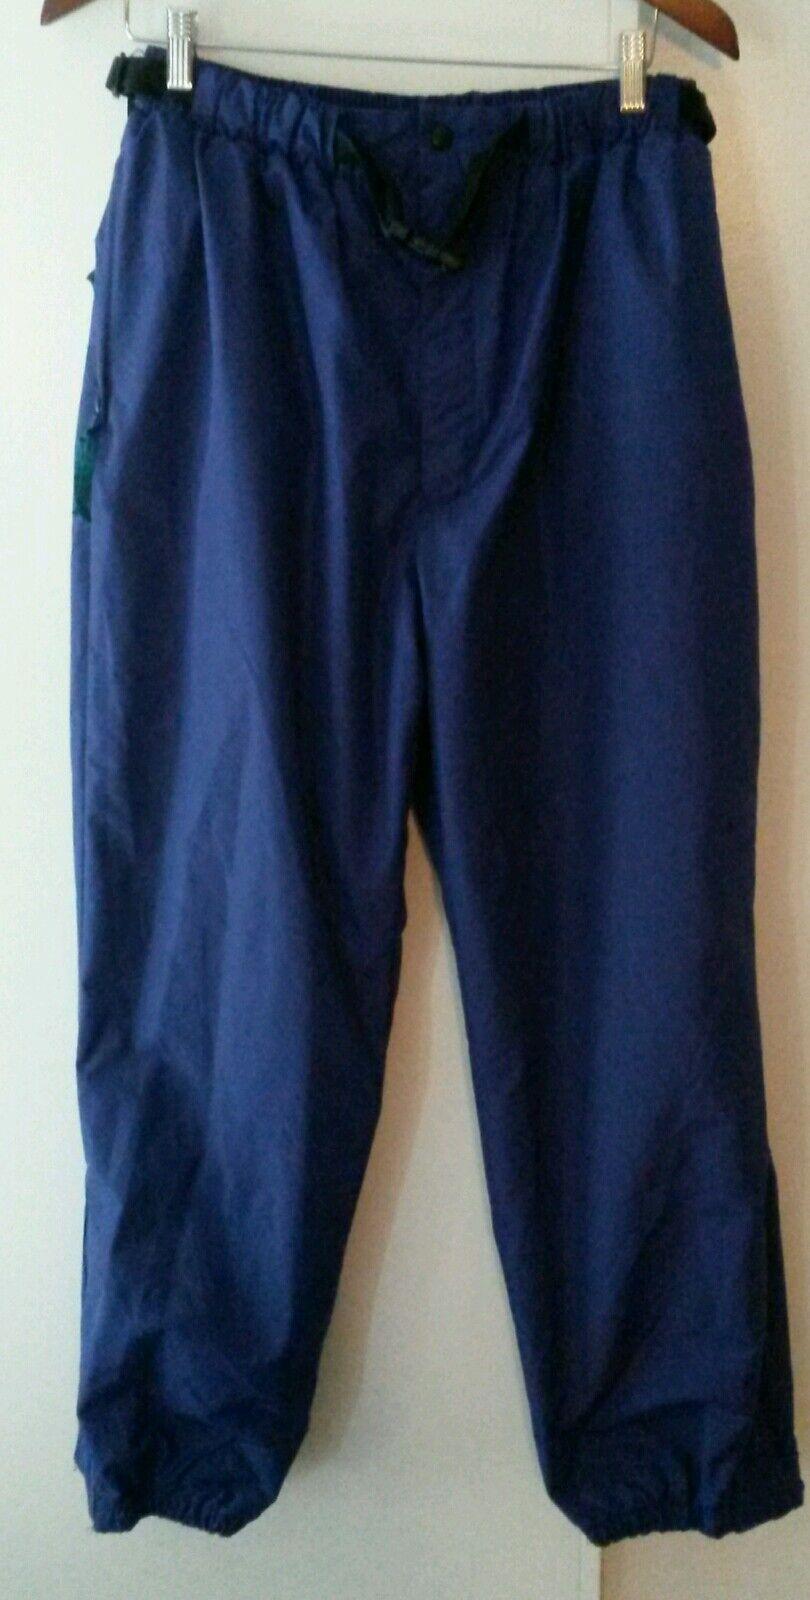 Sierra Sport Snow Board or Ski Pants - Size Medium